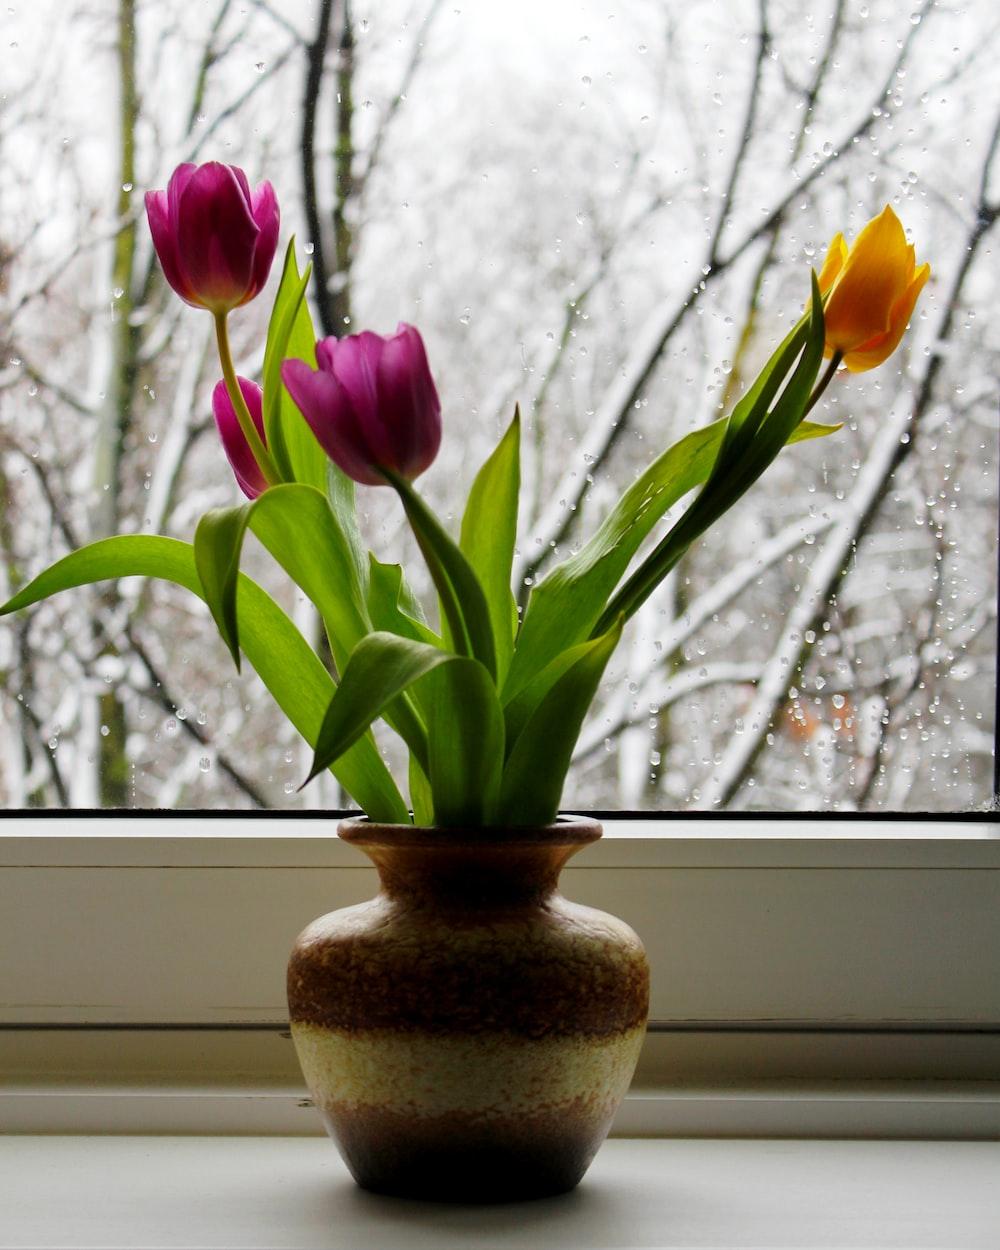 purple and yellow tulip flower